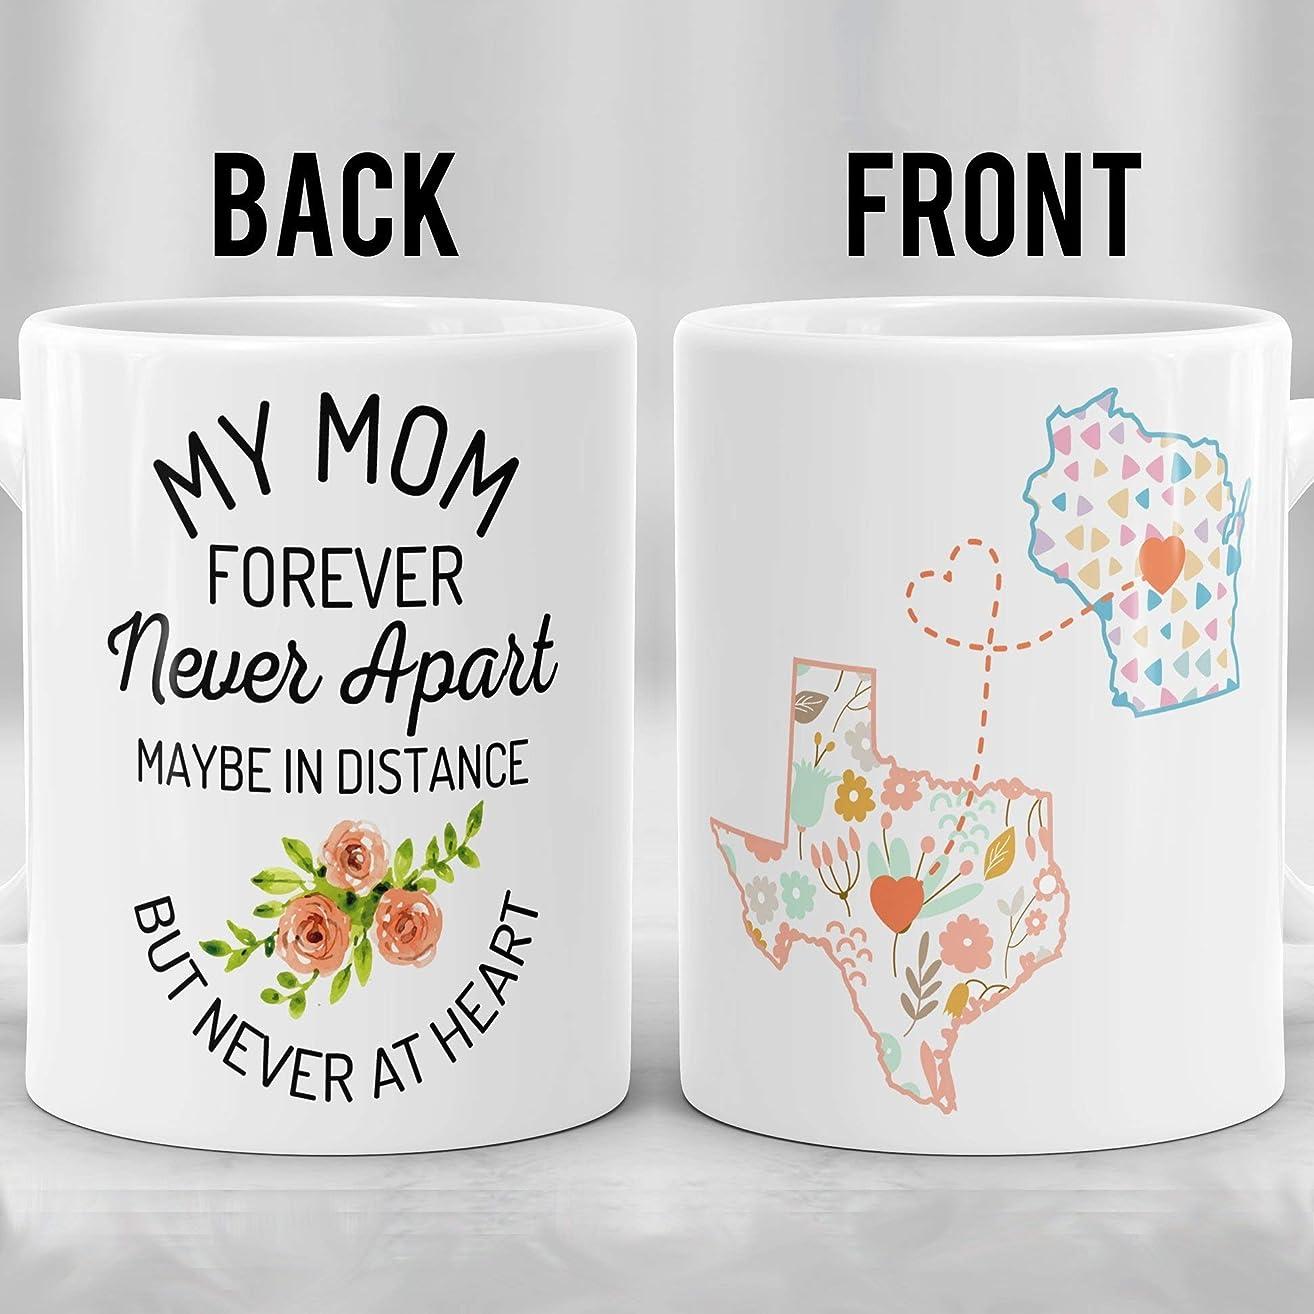 Mom Long Distance Mug, Moving Away Mug, State to State Mug, Connecting States Mug, Mother Mug, Mother's Day Gift, Gift for Mom, Moving Gift